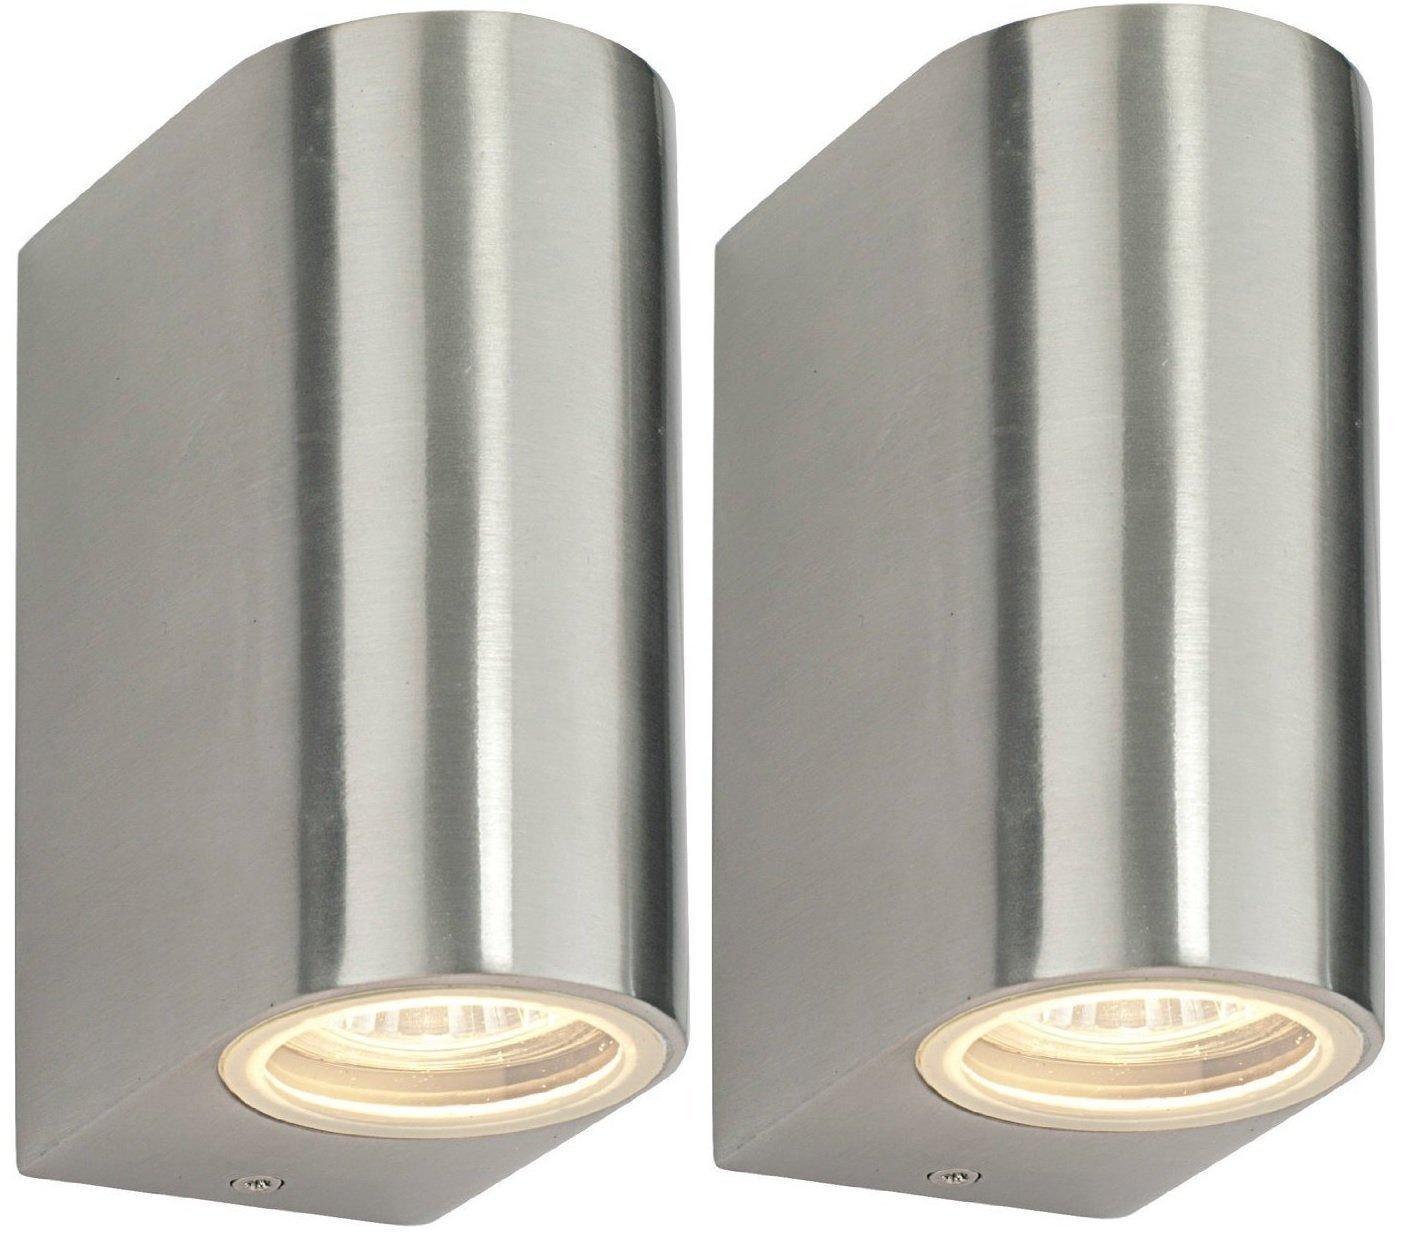 2 X Modern Double Outdoor Wall Light IP44 Up/Down Outdoor Wall Light ZLC023 Long Life Lamp Company ZLC232P